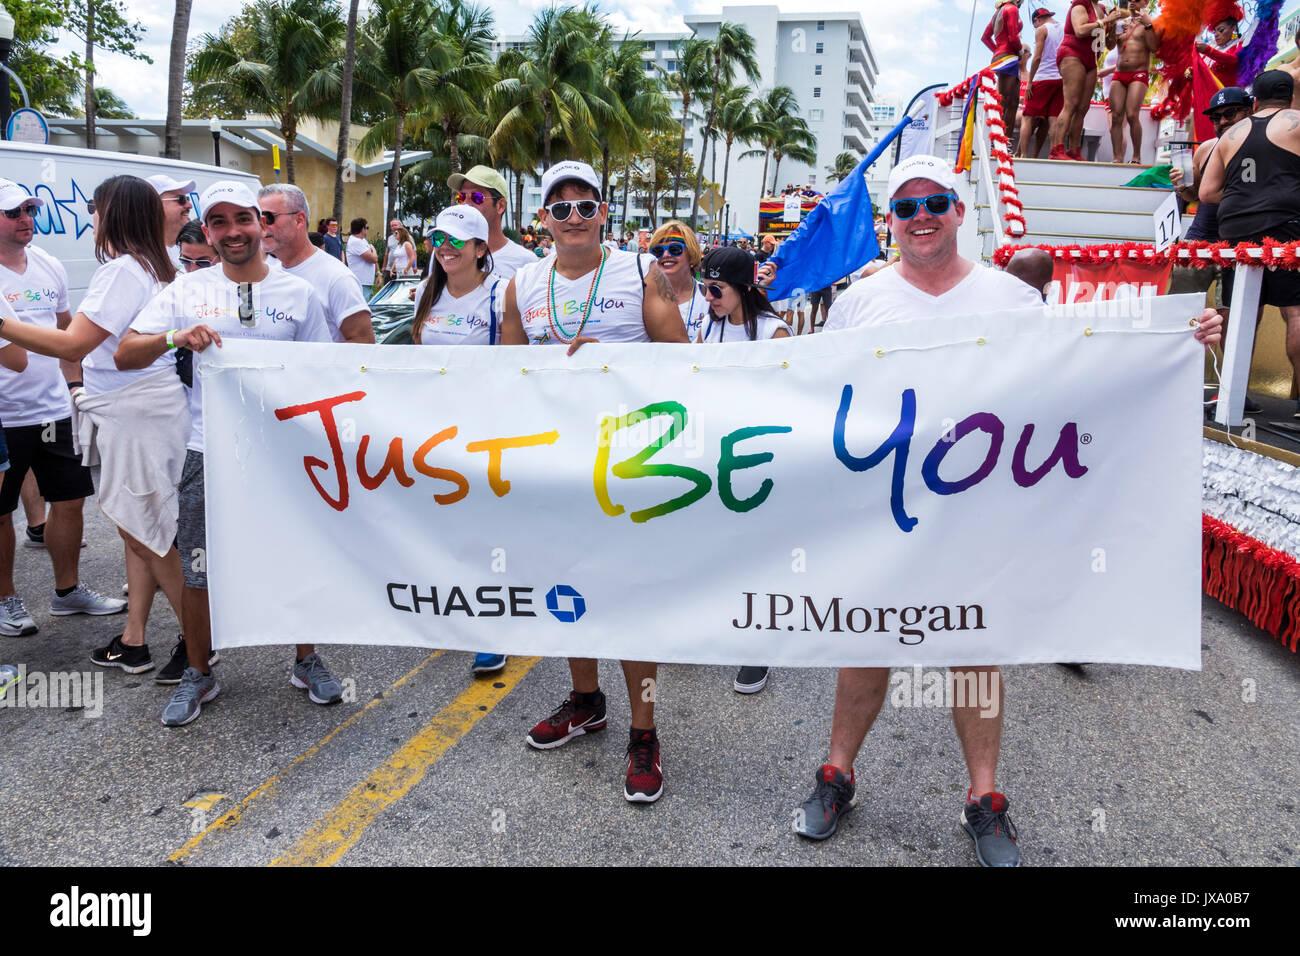 Miami Beach Florida Lummus Park Gay Pride Week LGBTQ LGBT Pride Parade participants staging area Chase JP Morgan Stock Photo